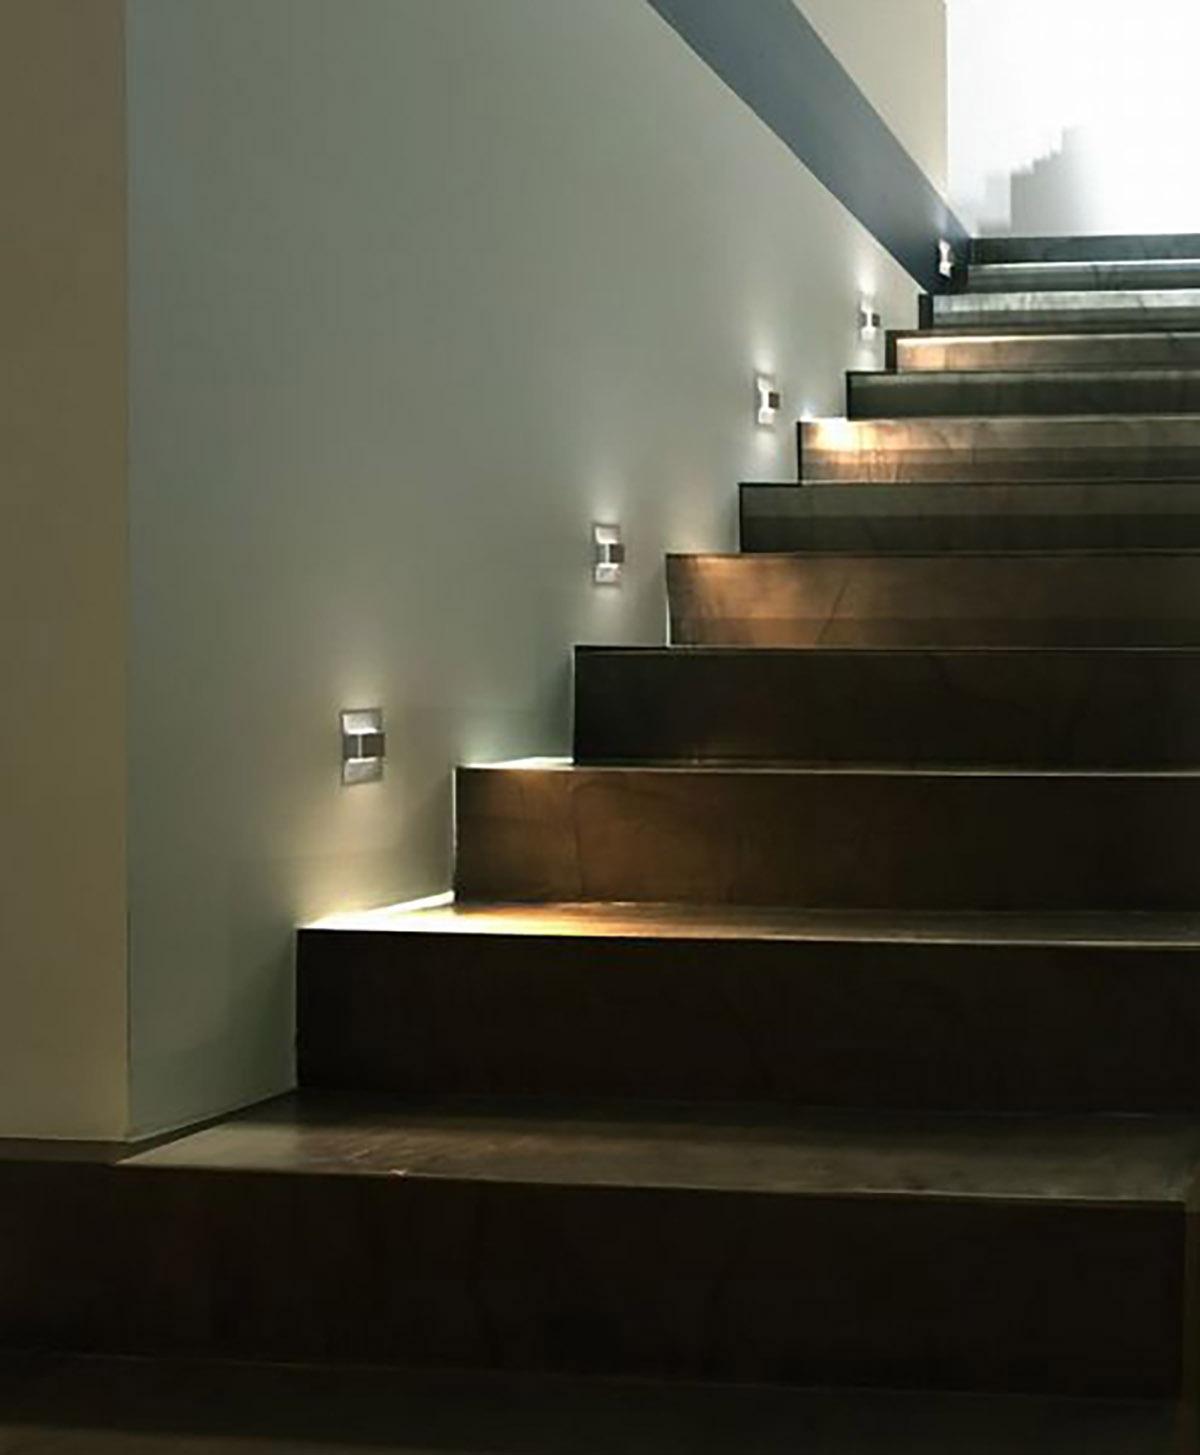 sauna beleuchtung magic duo led 0 6w 12v. Black Bedroom Furniture Sets. Home Design Ideas